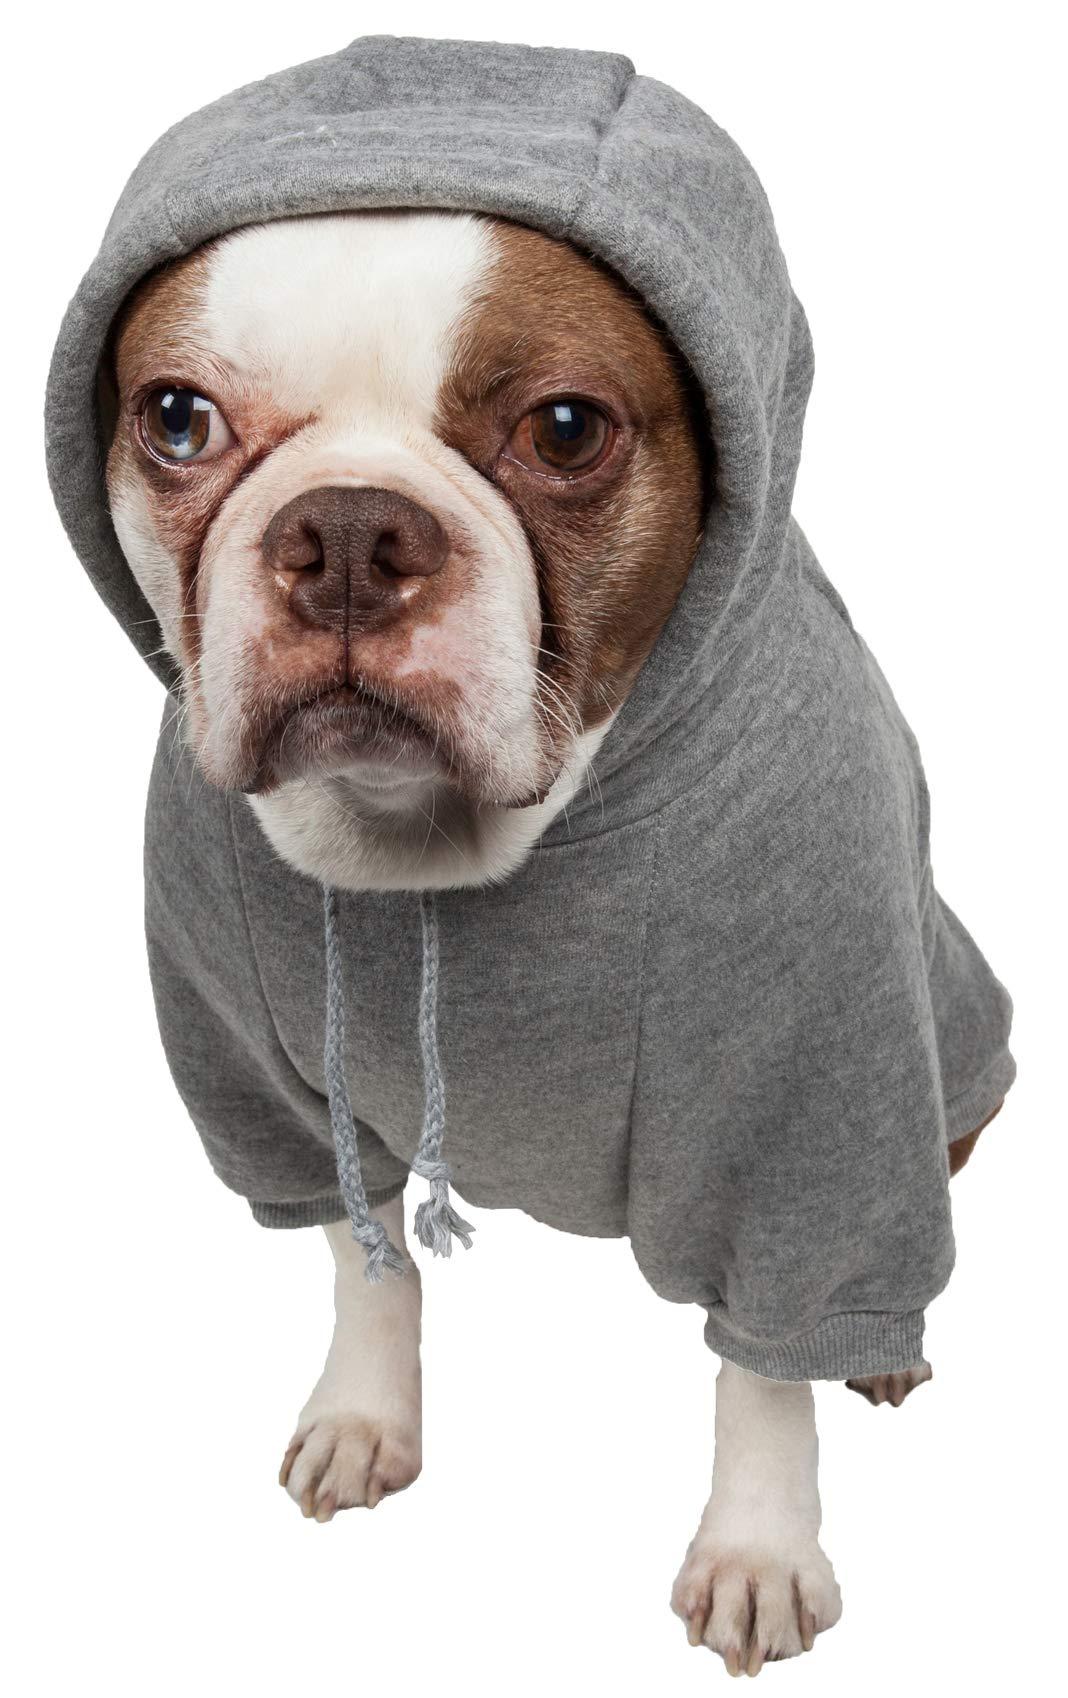 Pet Life American Classic' Designer Fashion Plush Cotton Pet Dog Hooded Sweater Hoodie, Large, Grey